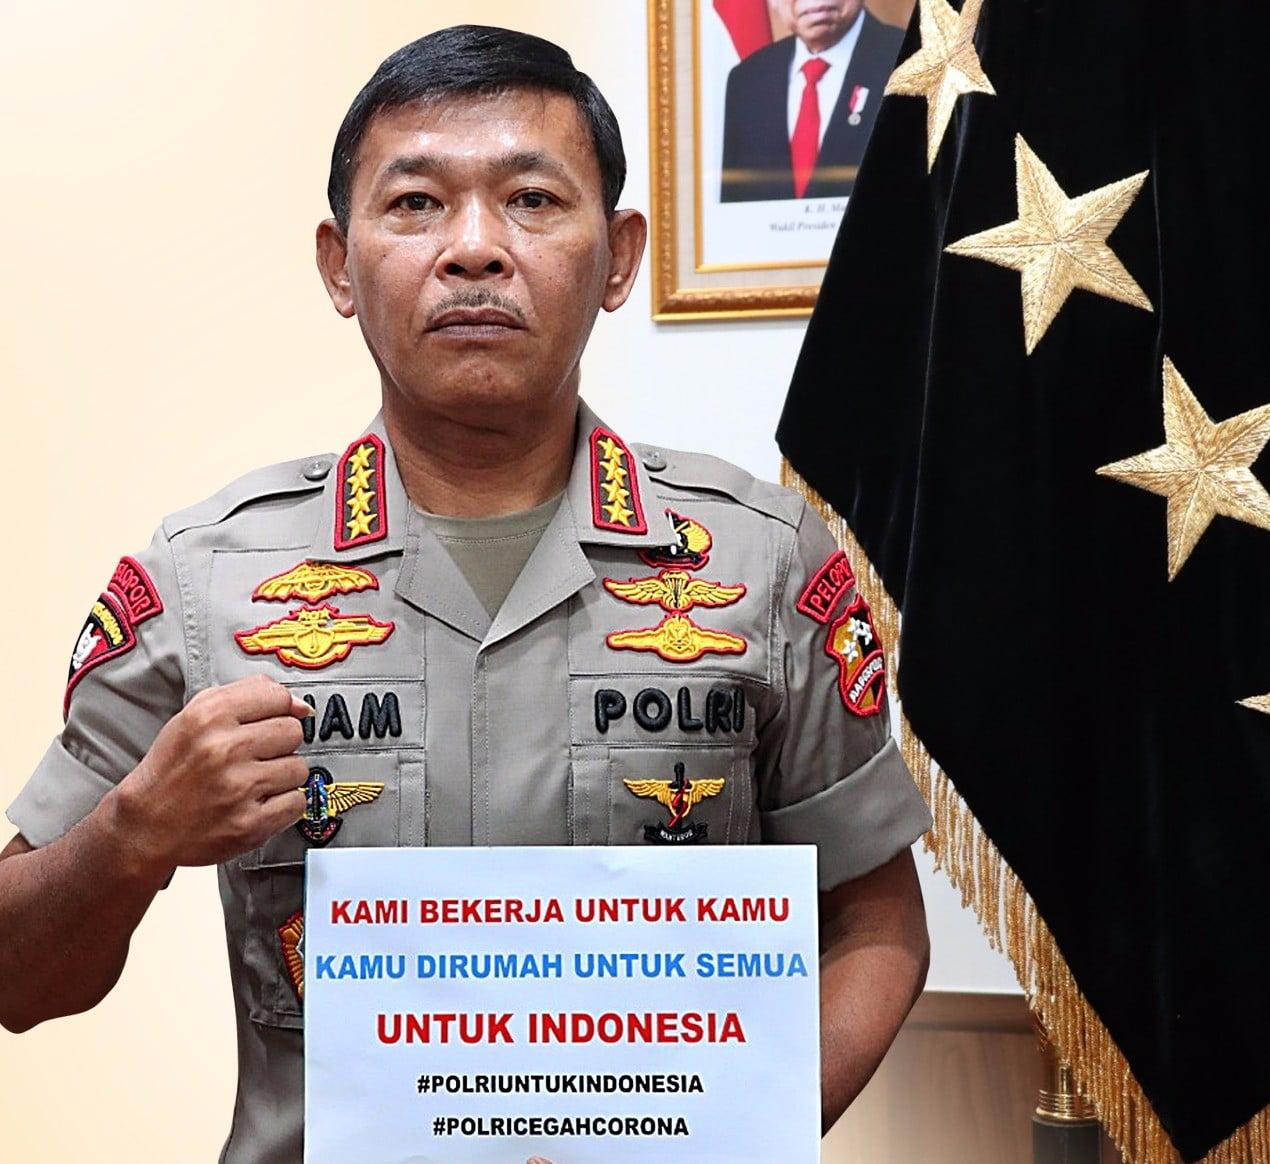 Kapolri Jenderal Idham Azis Meminta Maaf Ke Masyarakat